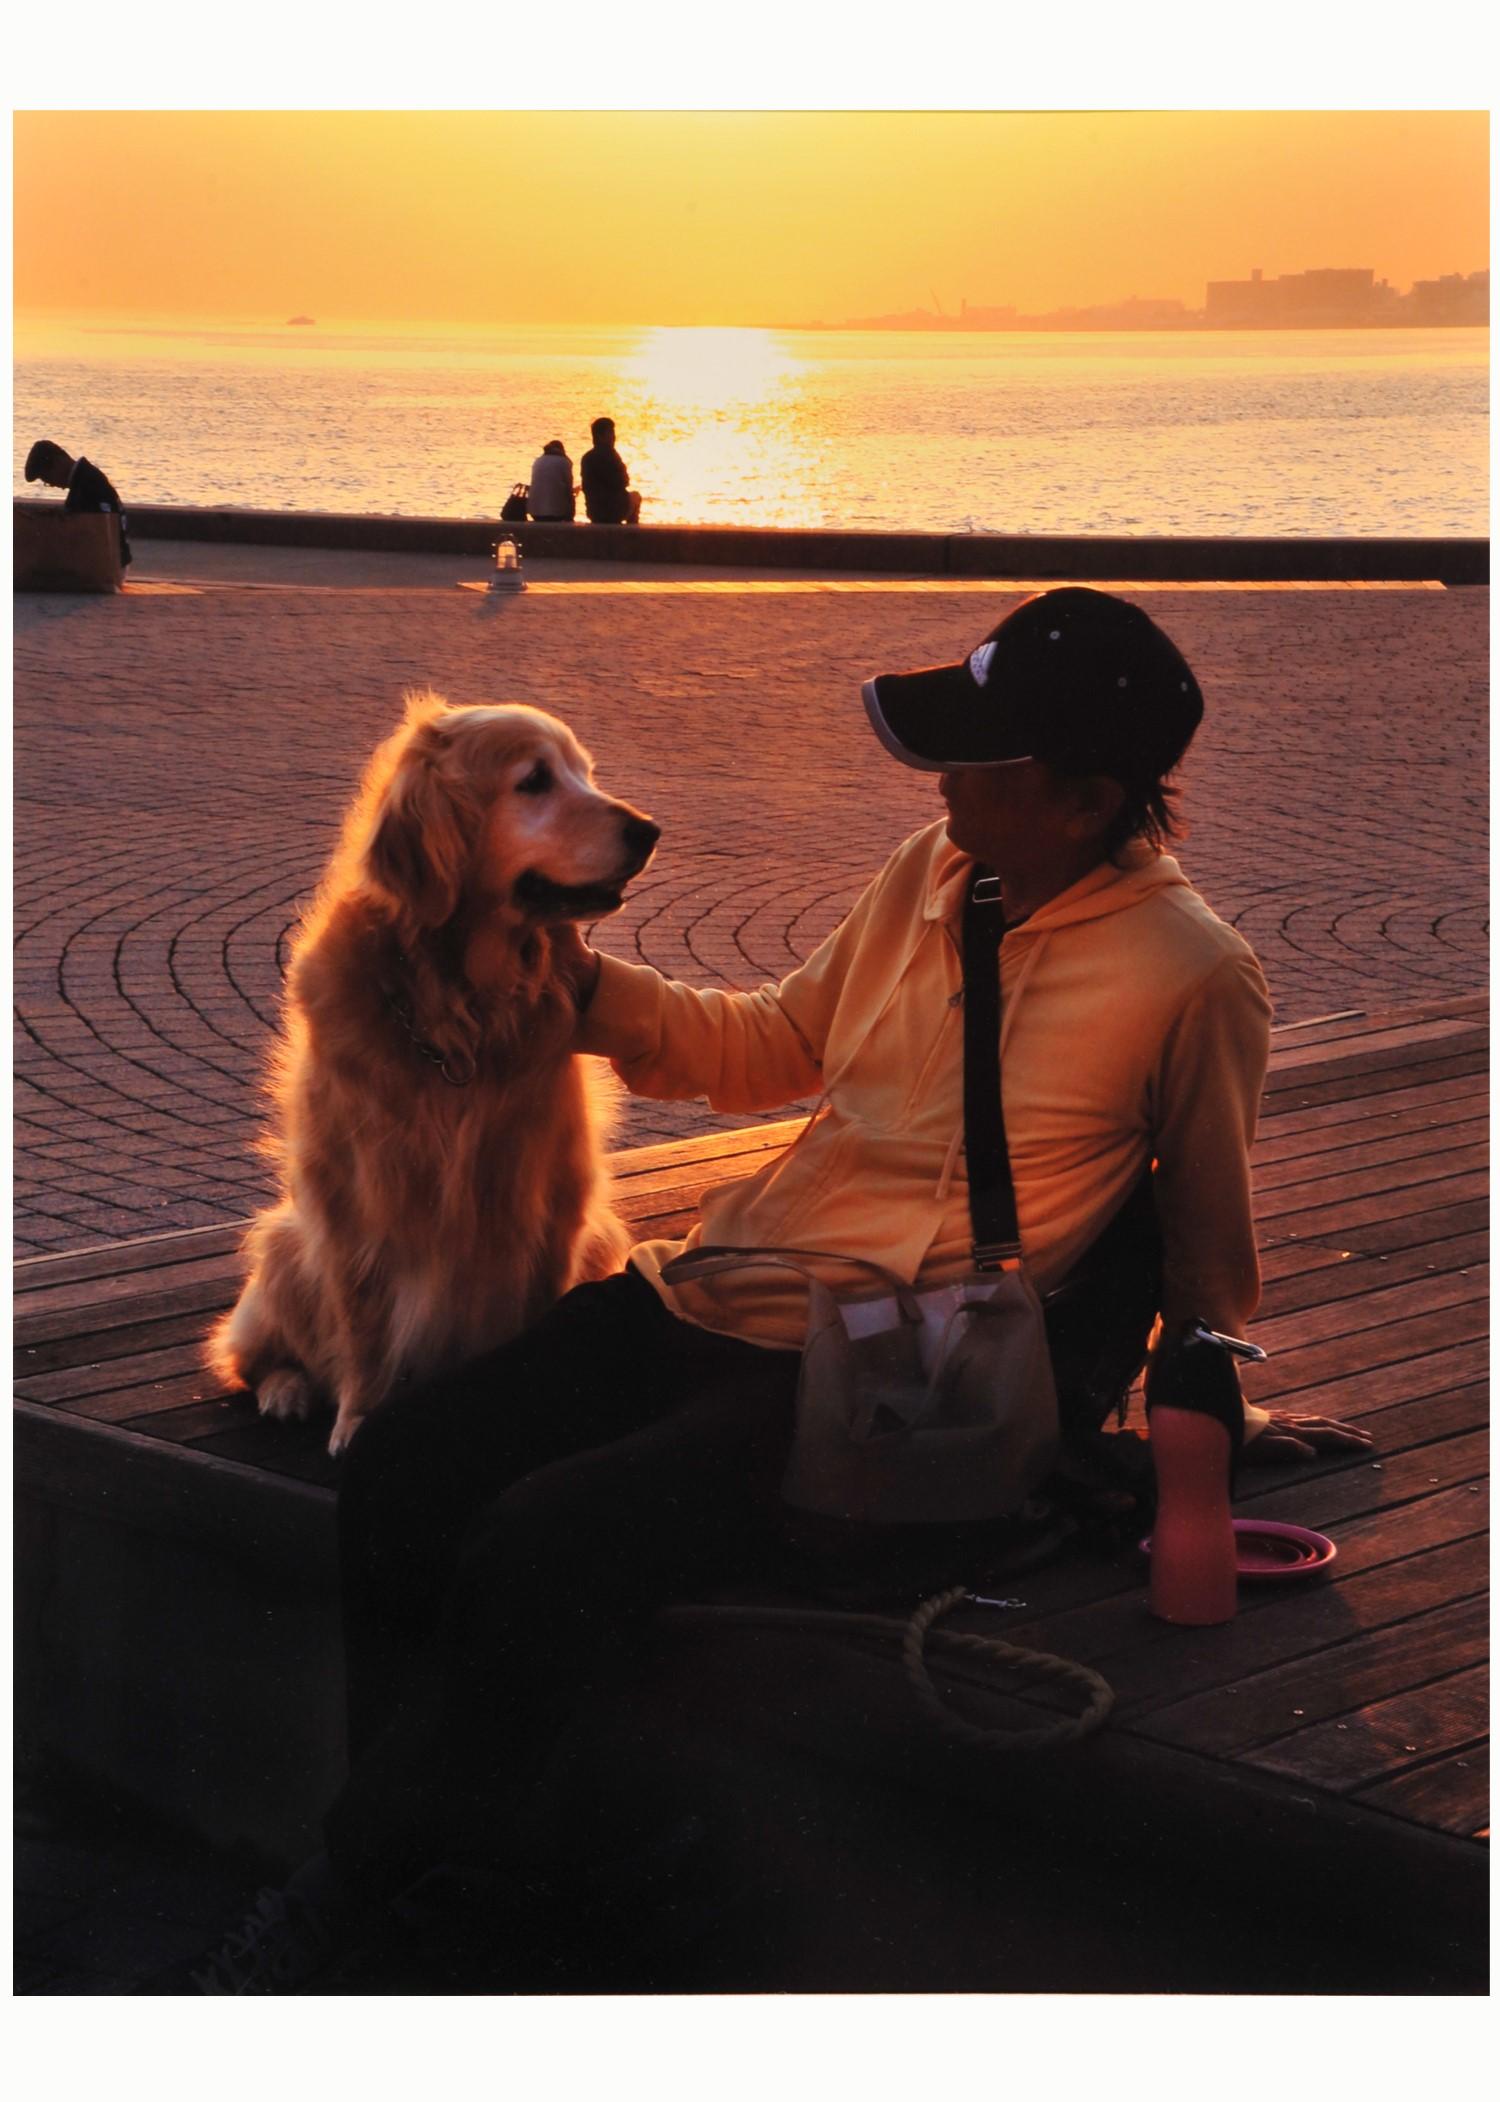 第54回特選 「愛犬と共に」 小梶 富士雄